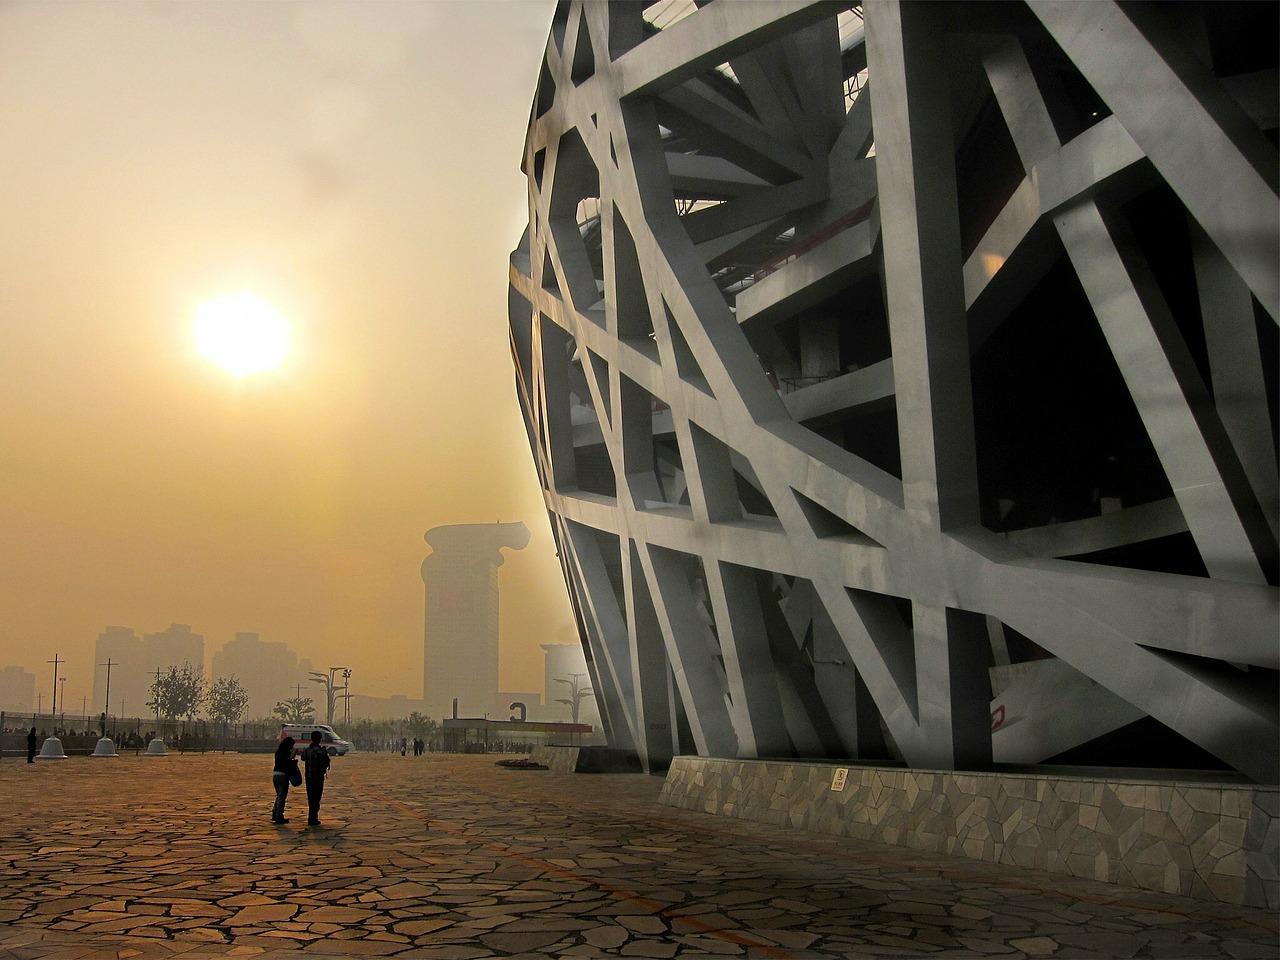 National stadium Peking